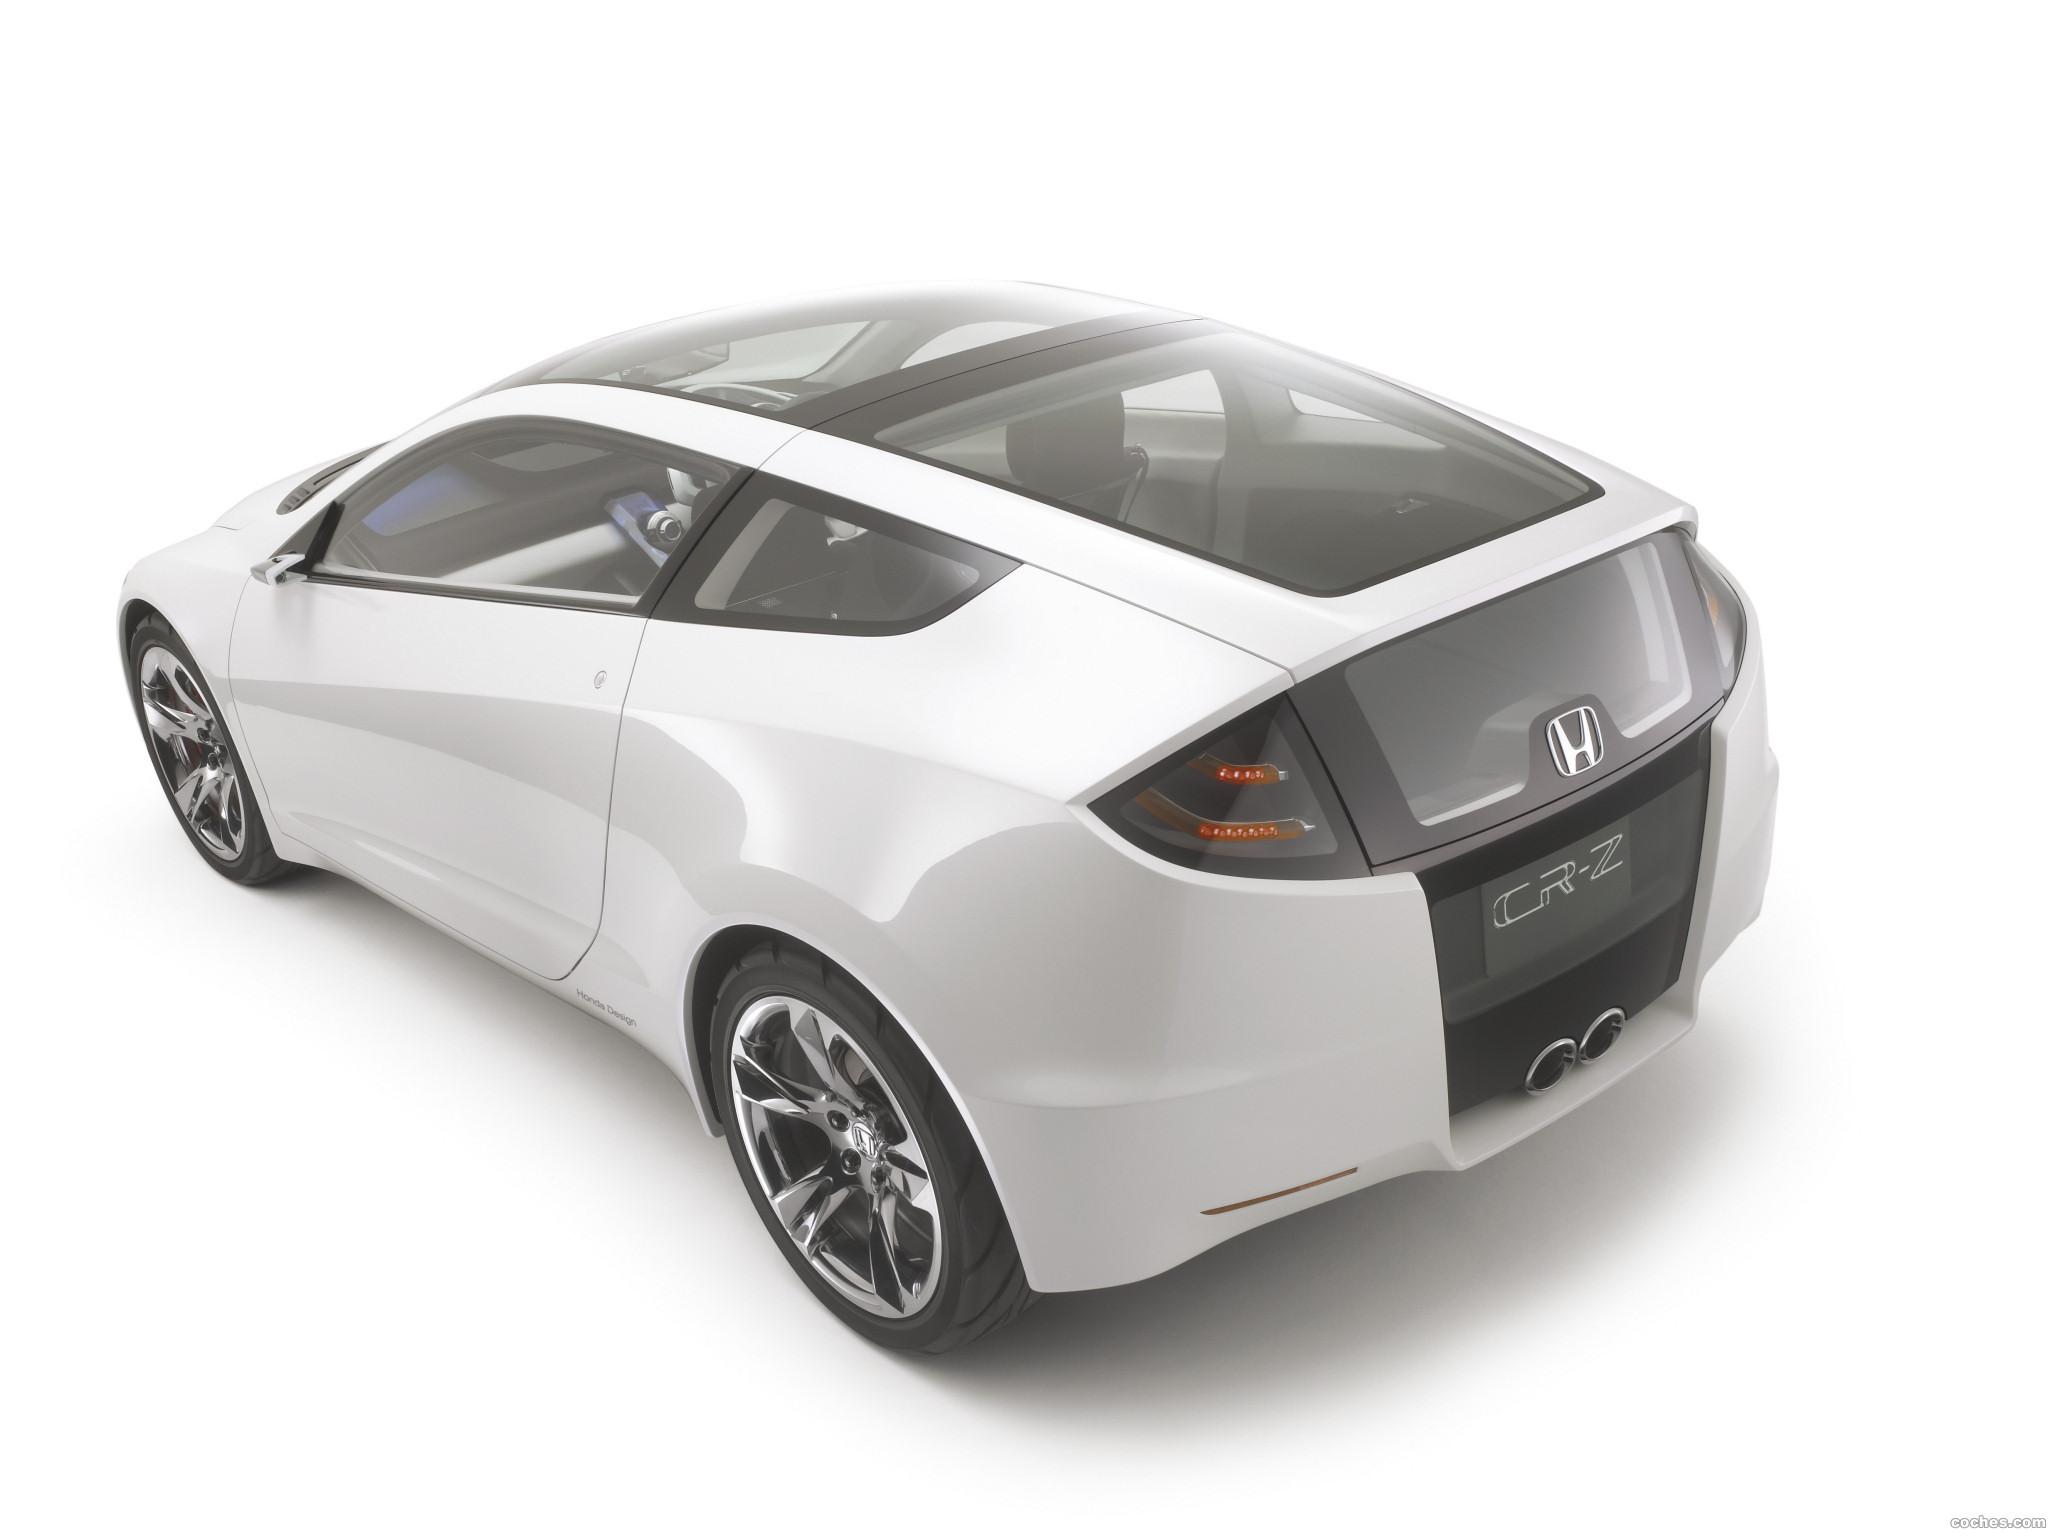 Foto 3 de Honda CR-Z Concept 2007